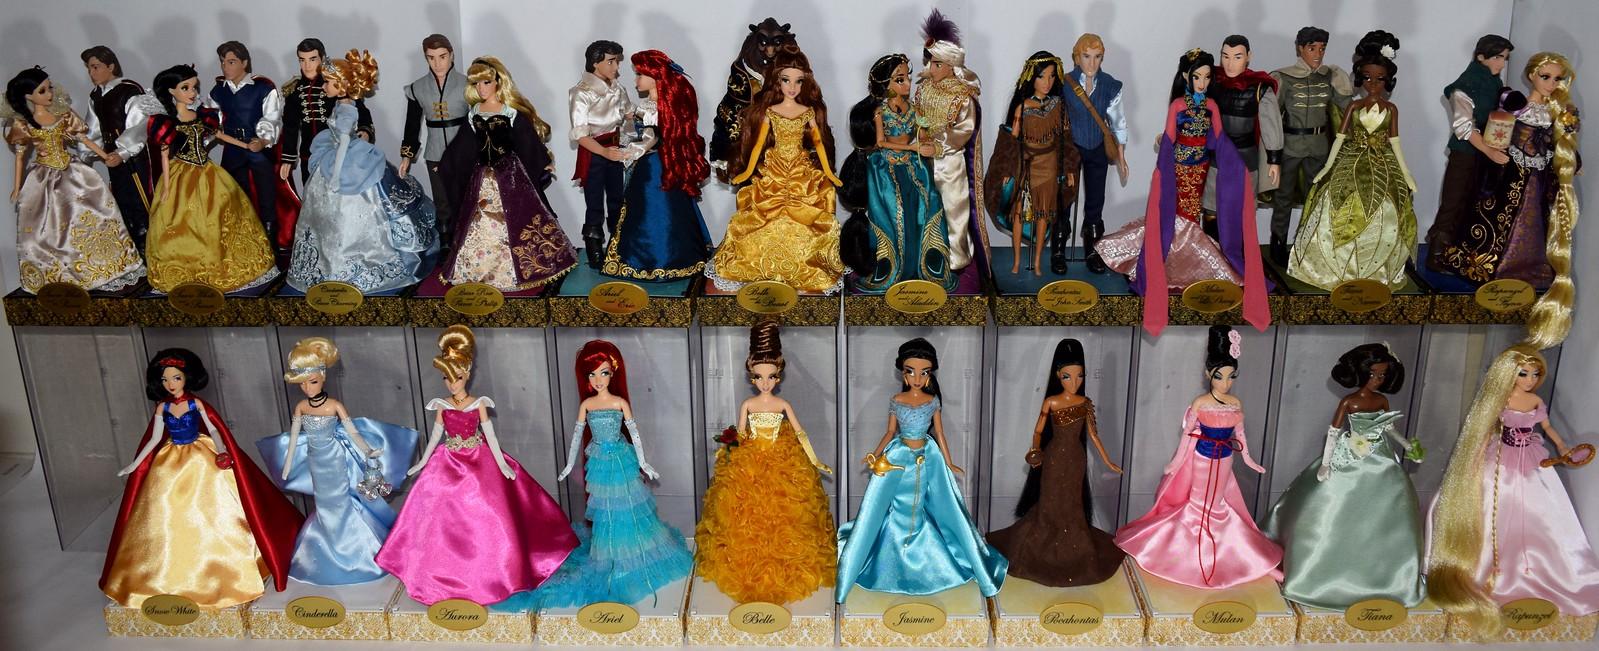 Disney Fairytale Designer Collection (depuis 2013) - Page 5 15615049882_da5200f21c_h